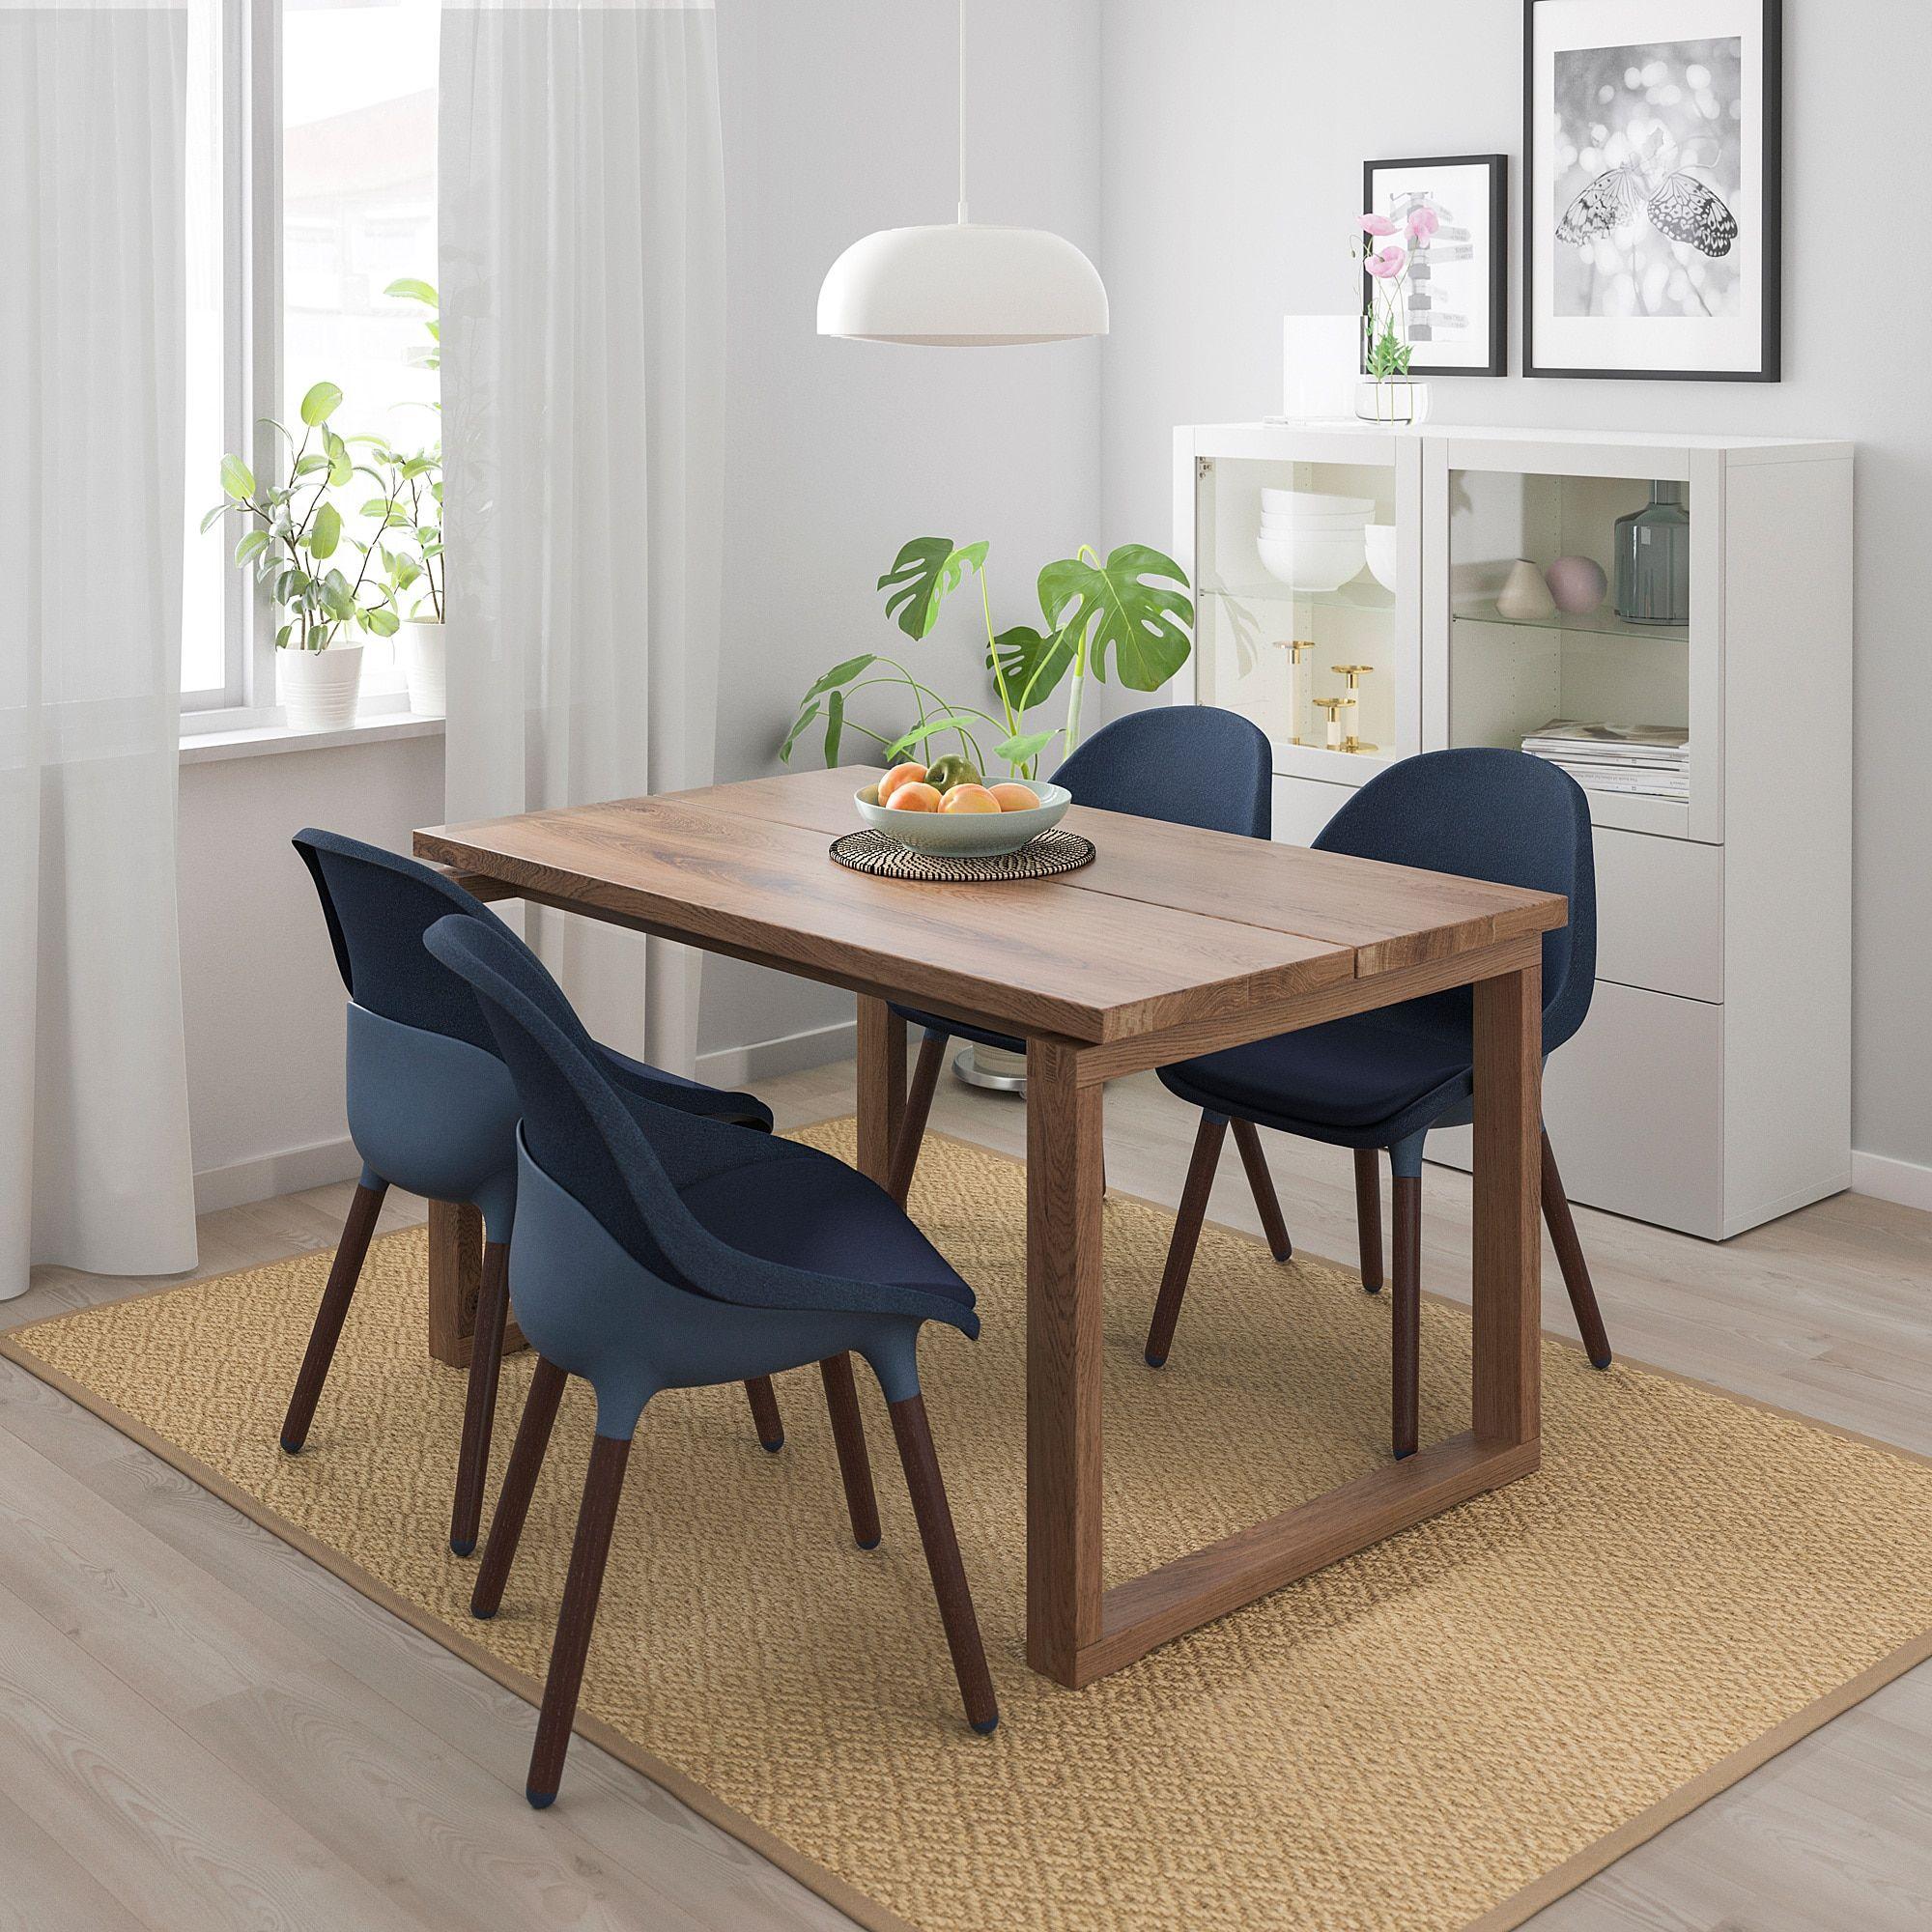 Ikea Morbylanga Baltsar Table And 4 Chairs In 2020 Ikea